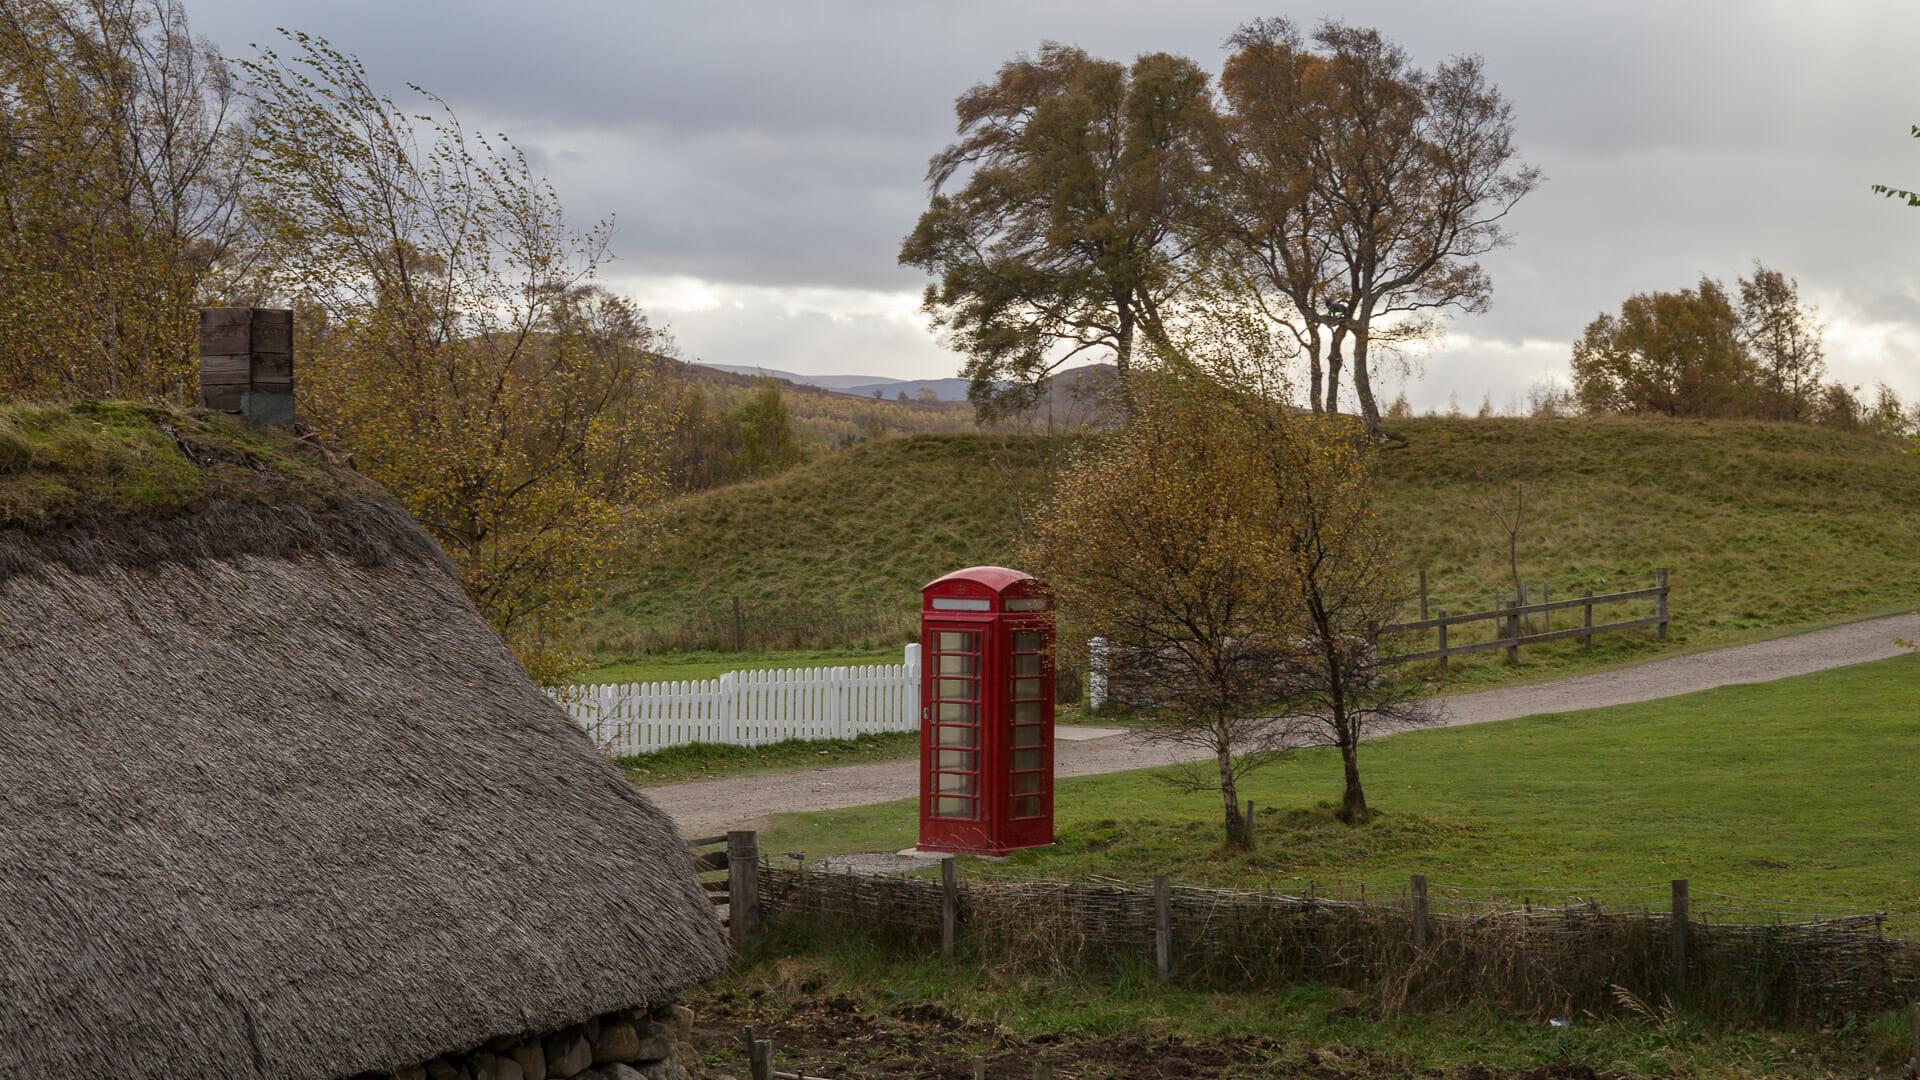 Alte Telefonzelle am Wegesrand